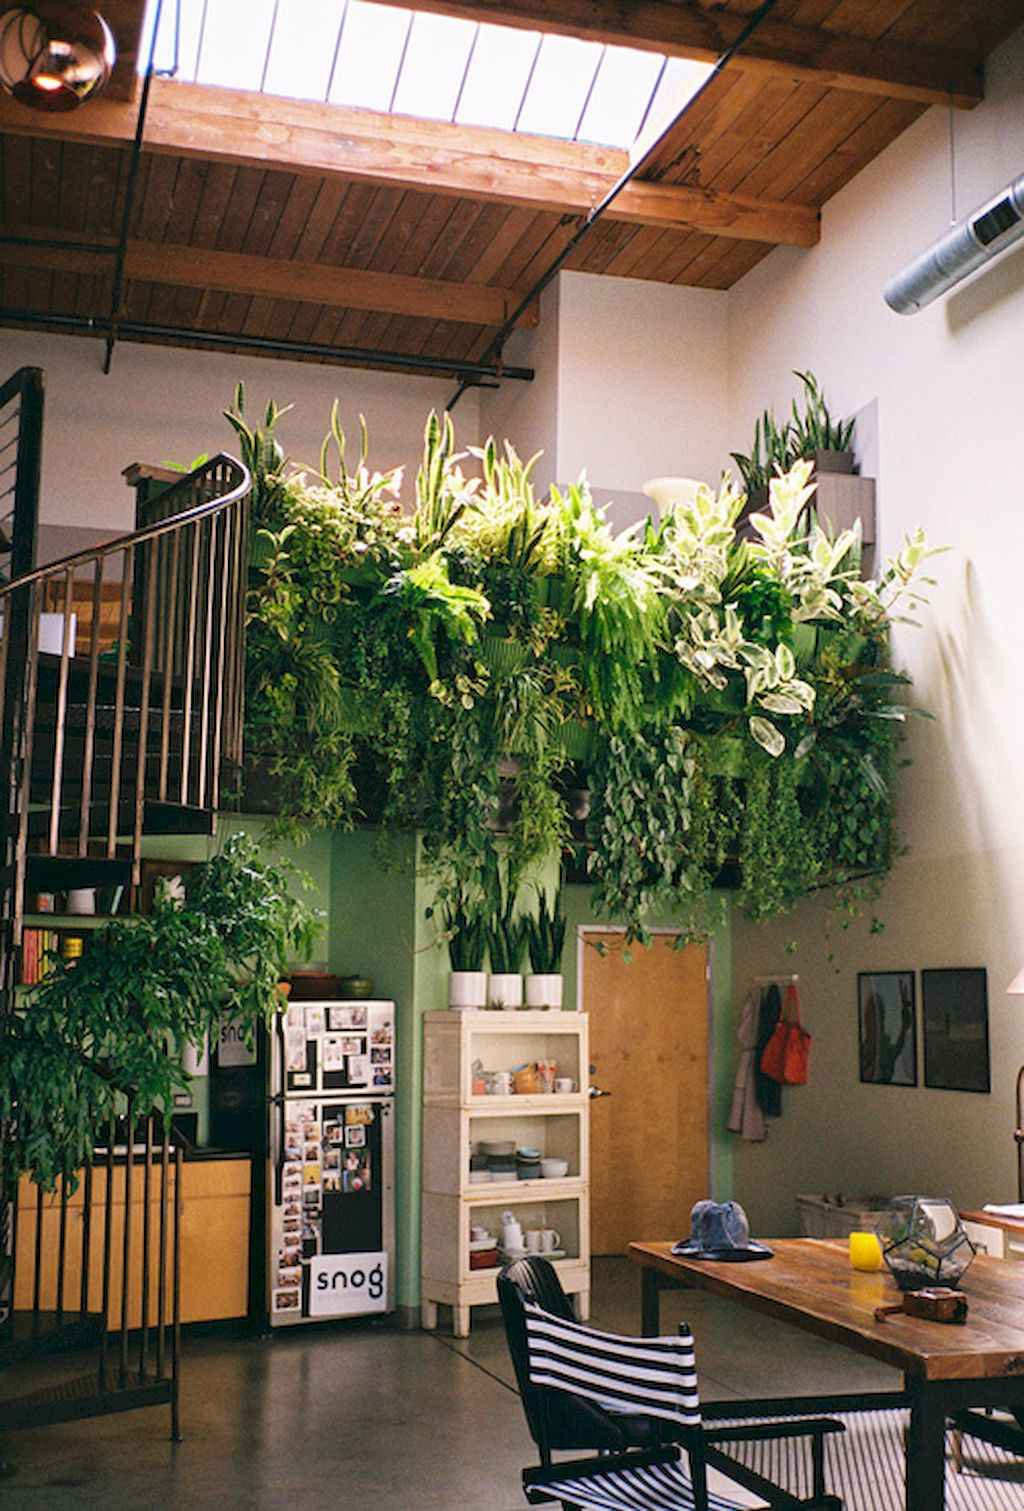 Cool creative loft apartment decorating ideas (58)